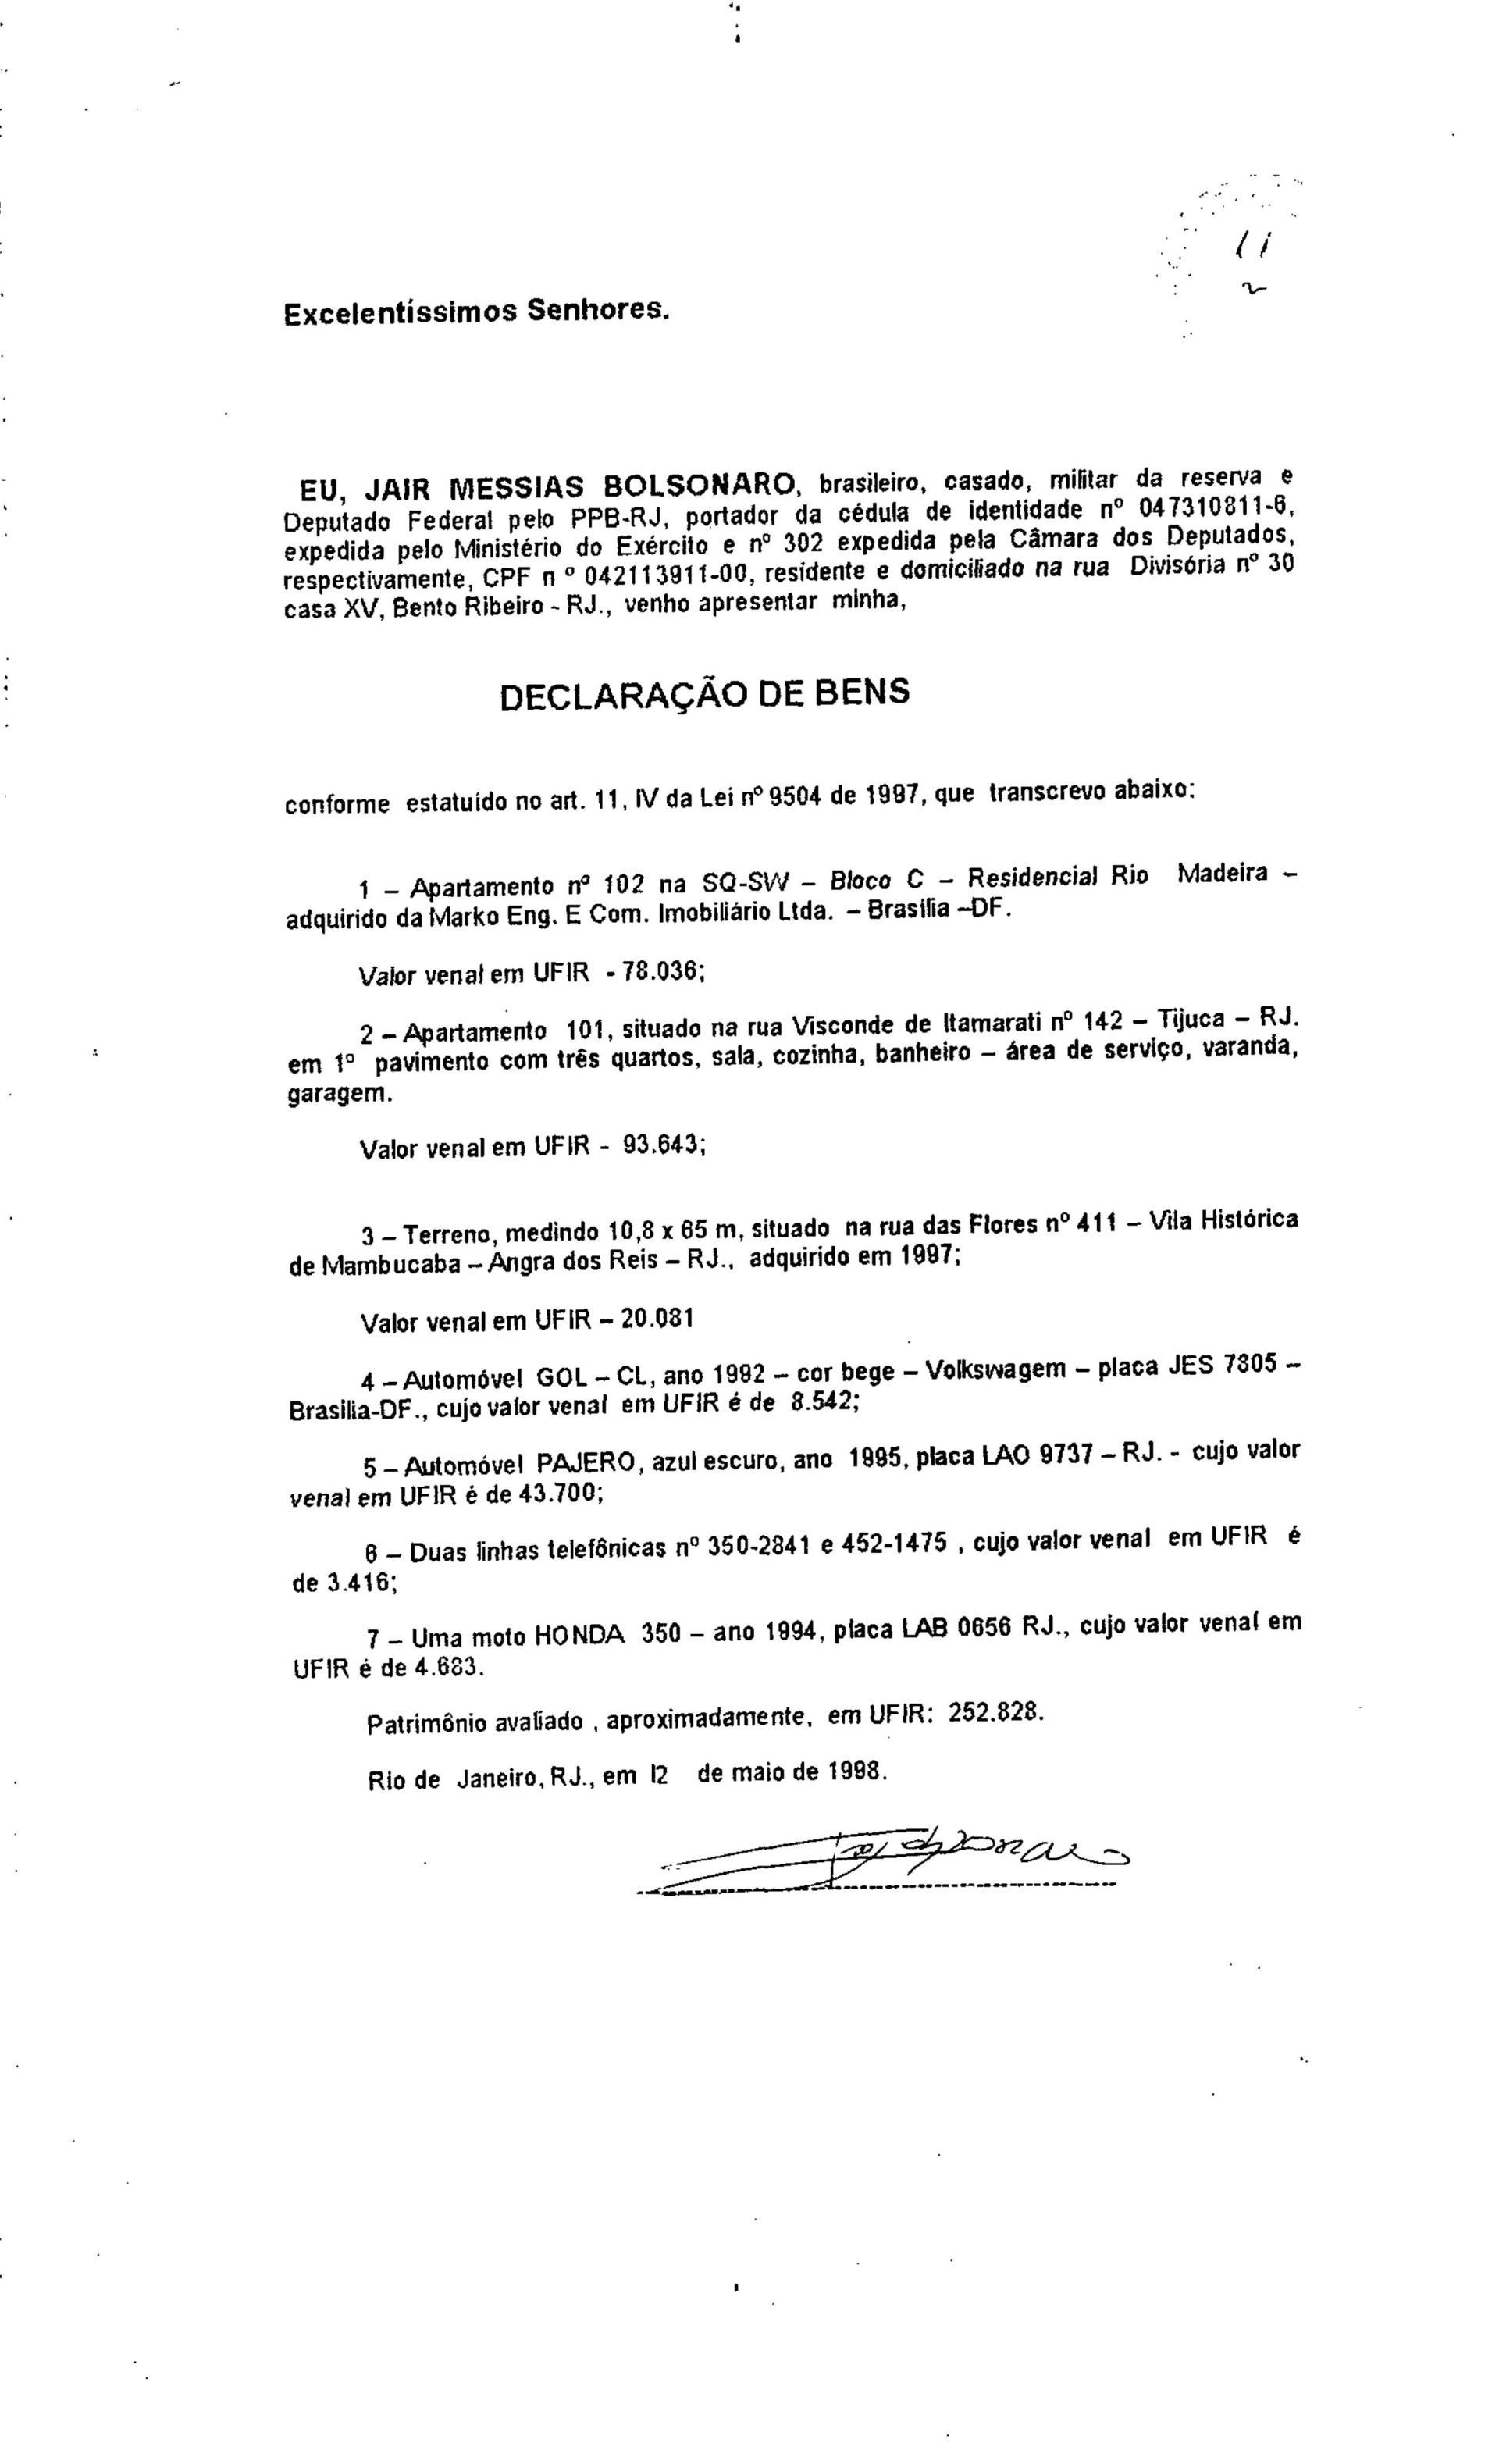 Eleições 1998 - R$ 252.828